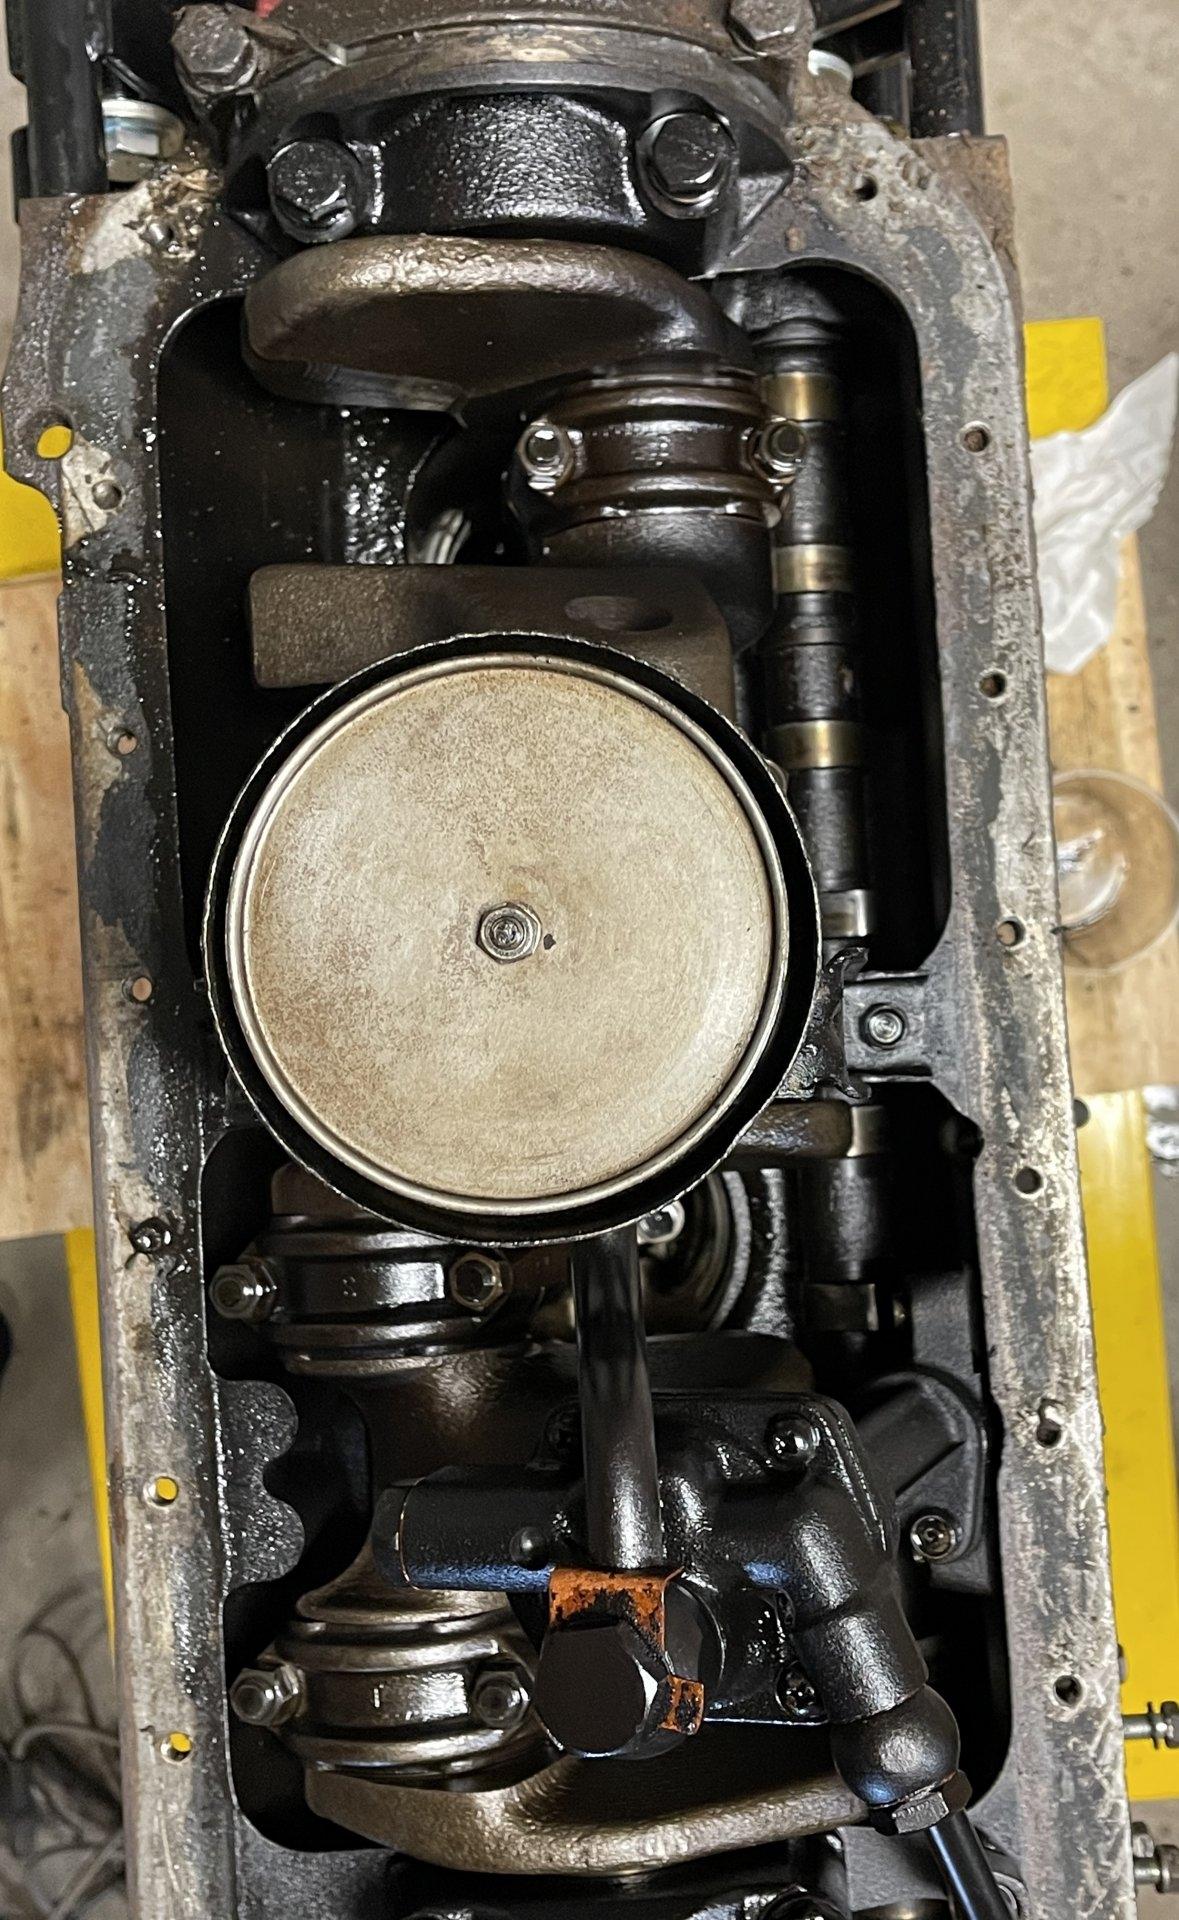 D0C760DC-9E54-45C4-A781-8DFB31FAB37A.jpeg